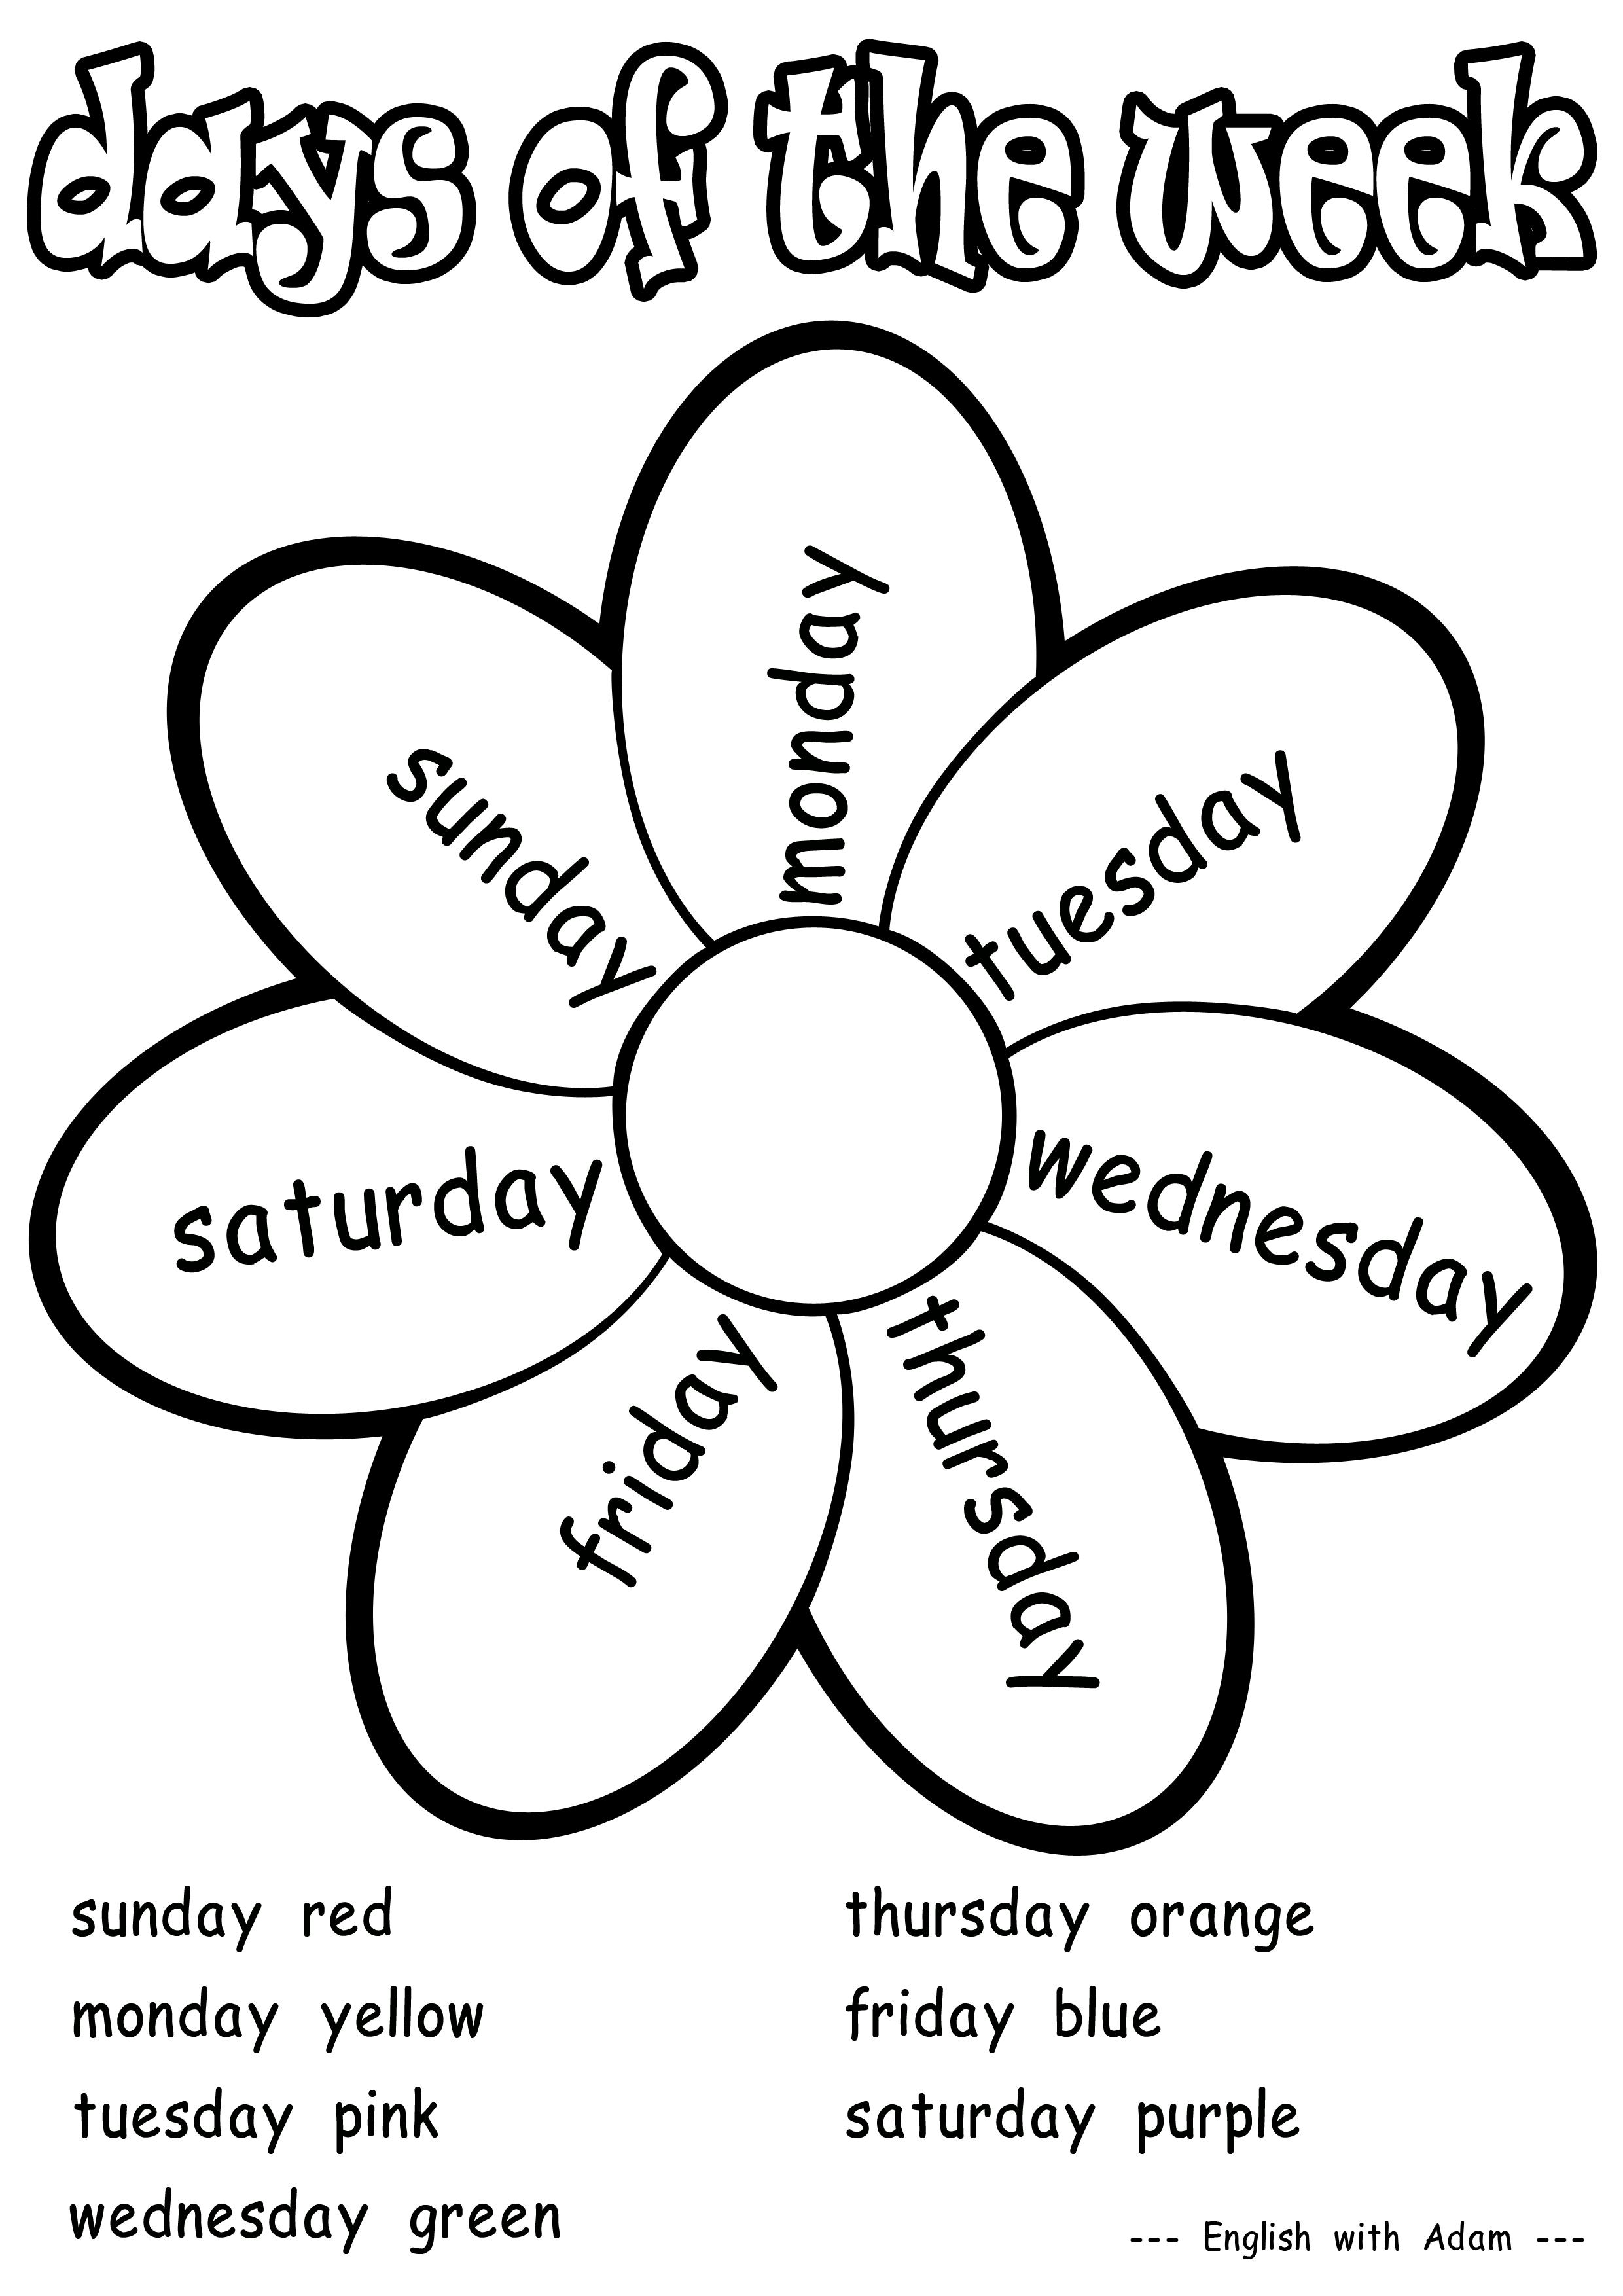 colouring worksheets for grade 1 1st grade math coloring worksheets halloween google worksheets colouring grade for 1